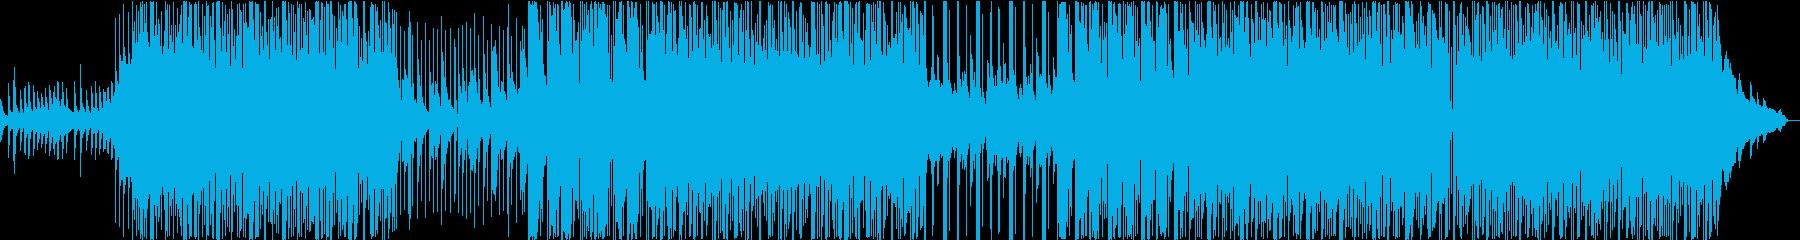 Sad Trap Type Beatの再生済みの波形